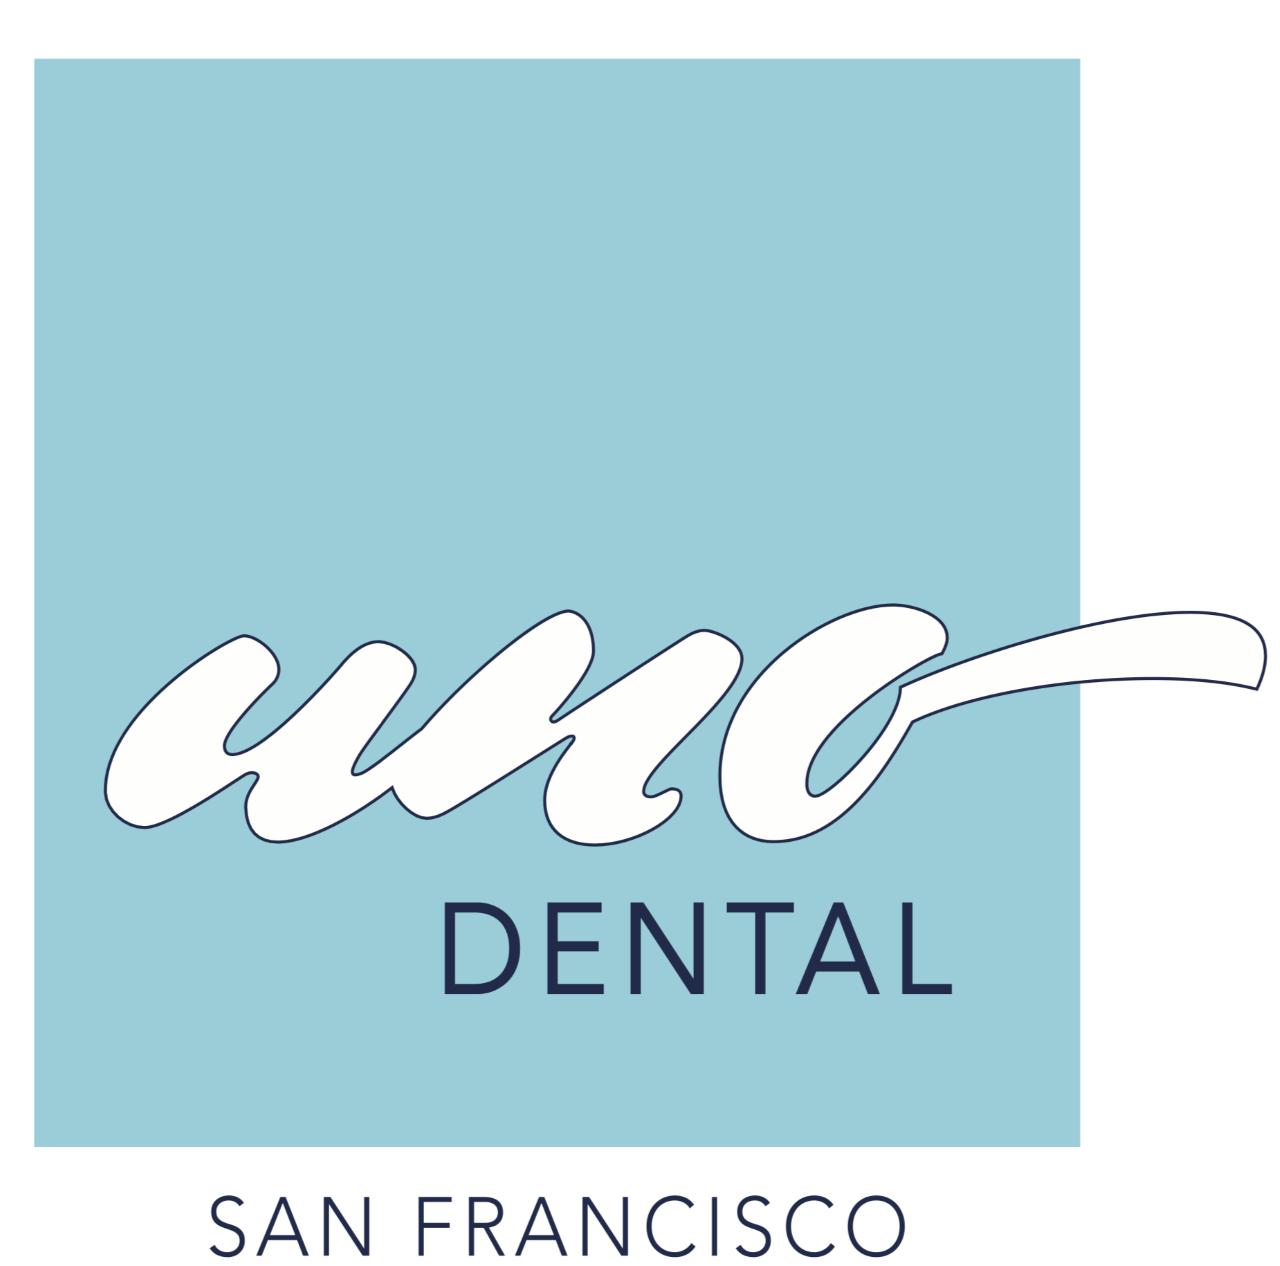 UNO DENTAL SAN FRANCISCO Company Logo